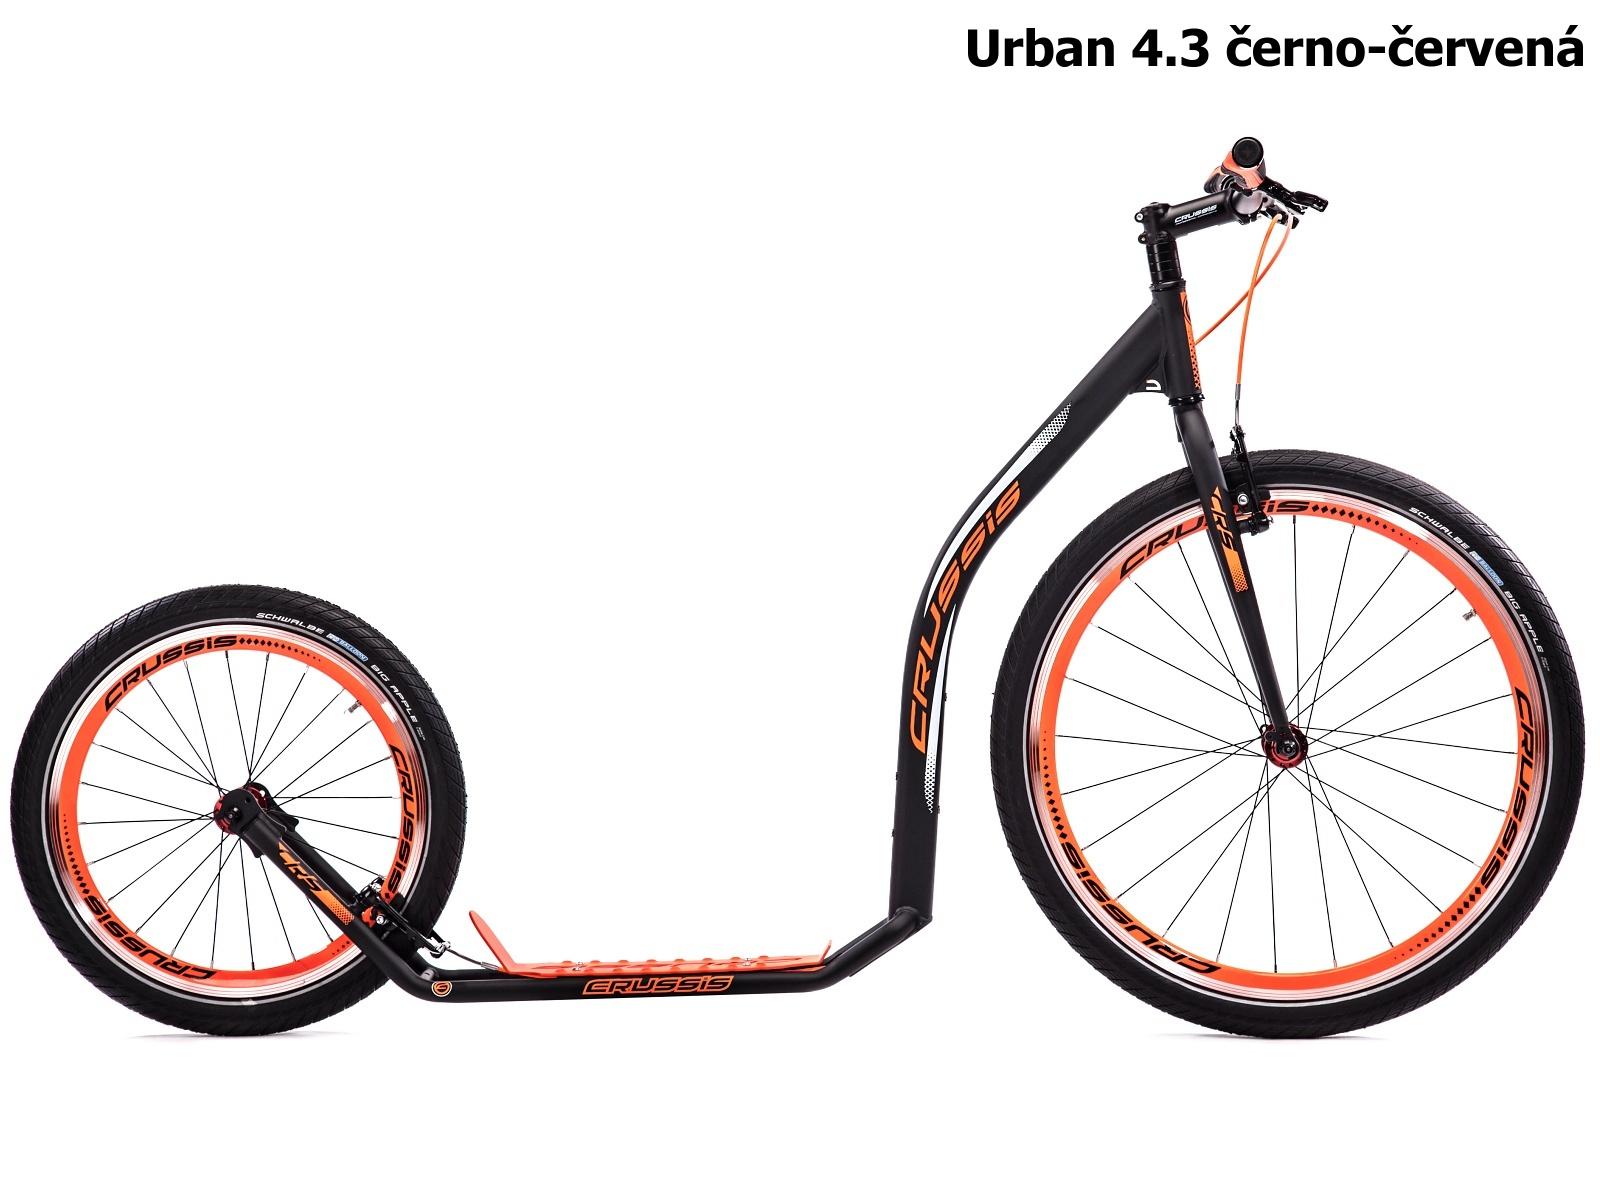 Koloběžka CRUSSIS Urban 4.3 černo-červená